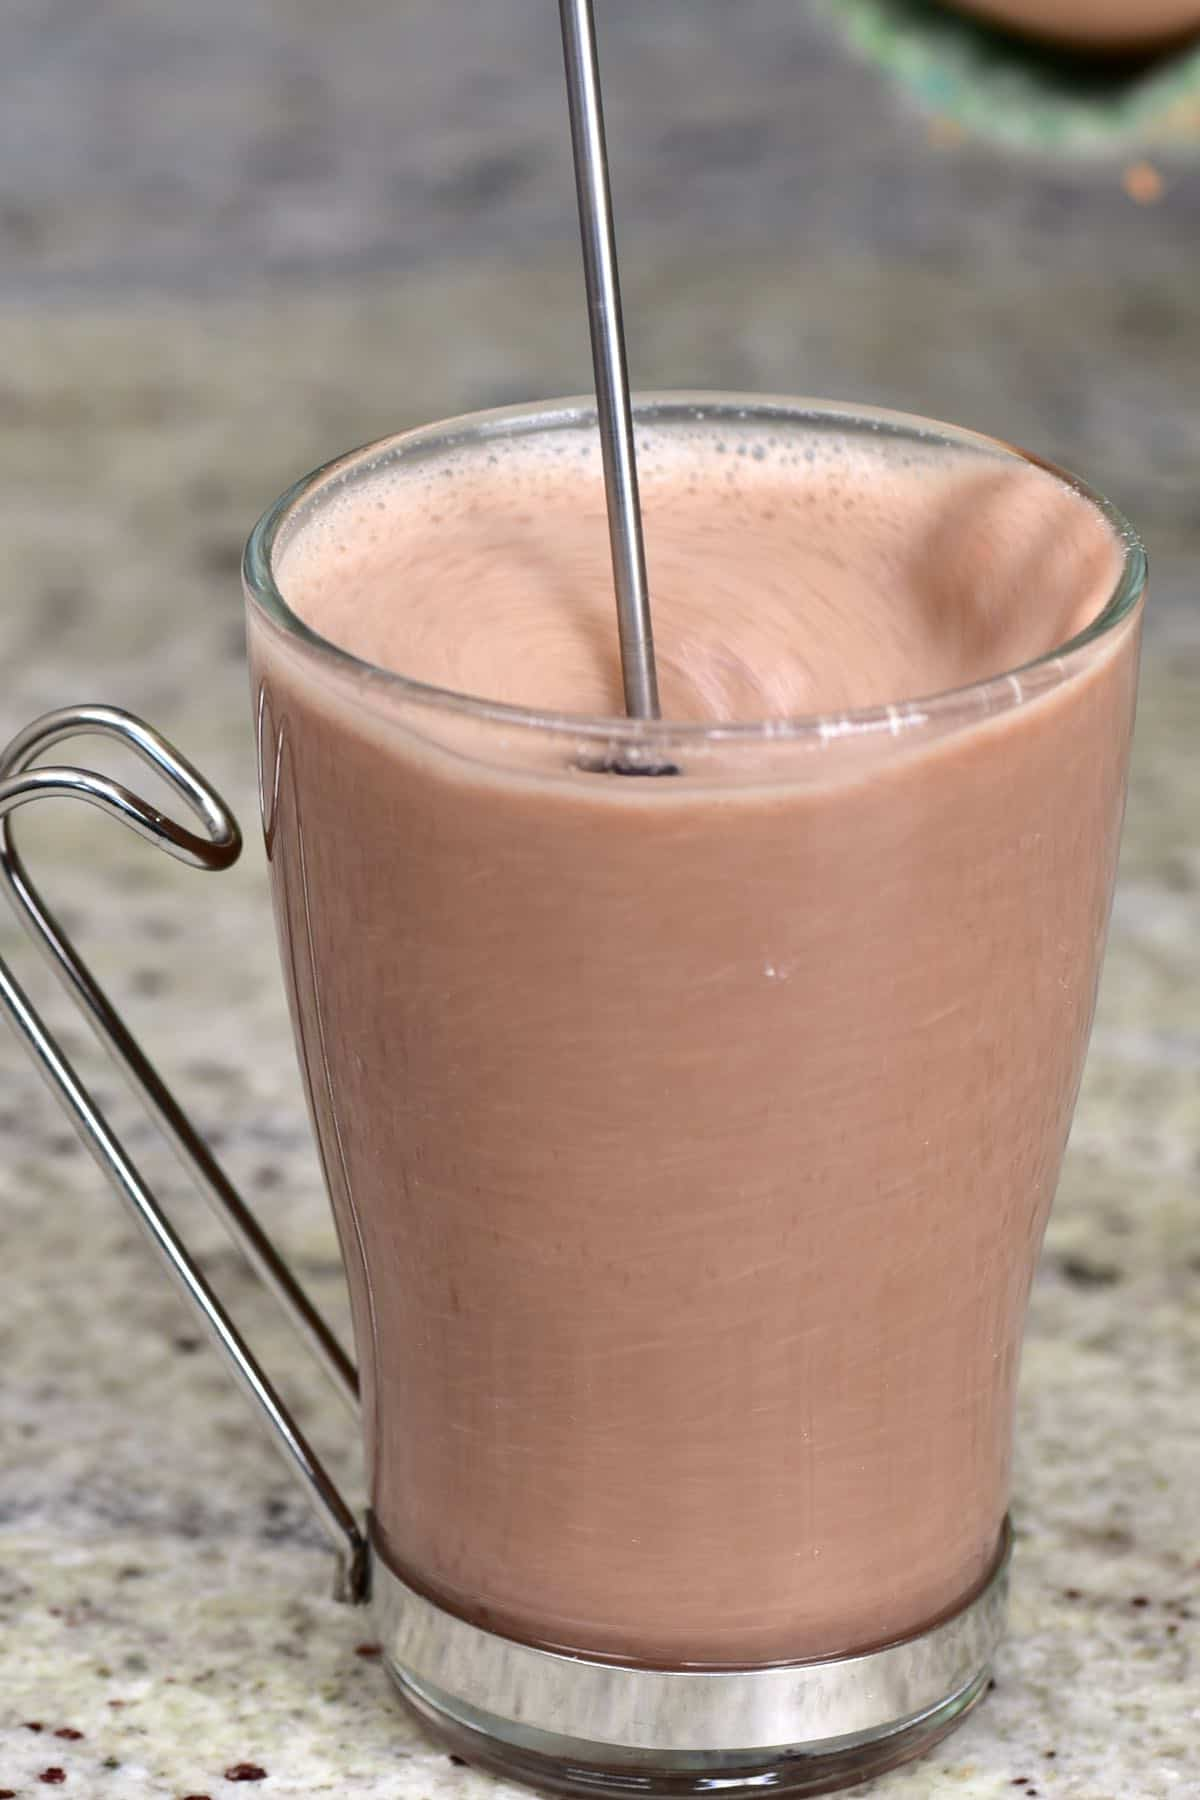 Stirring hot chocolate in a glass